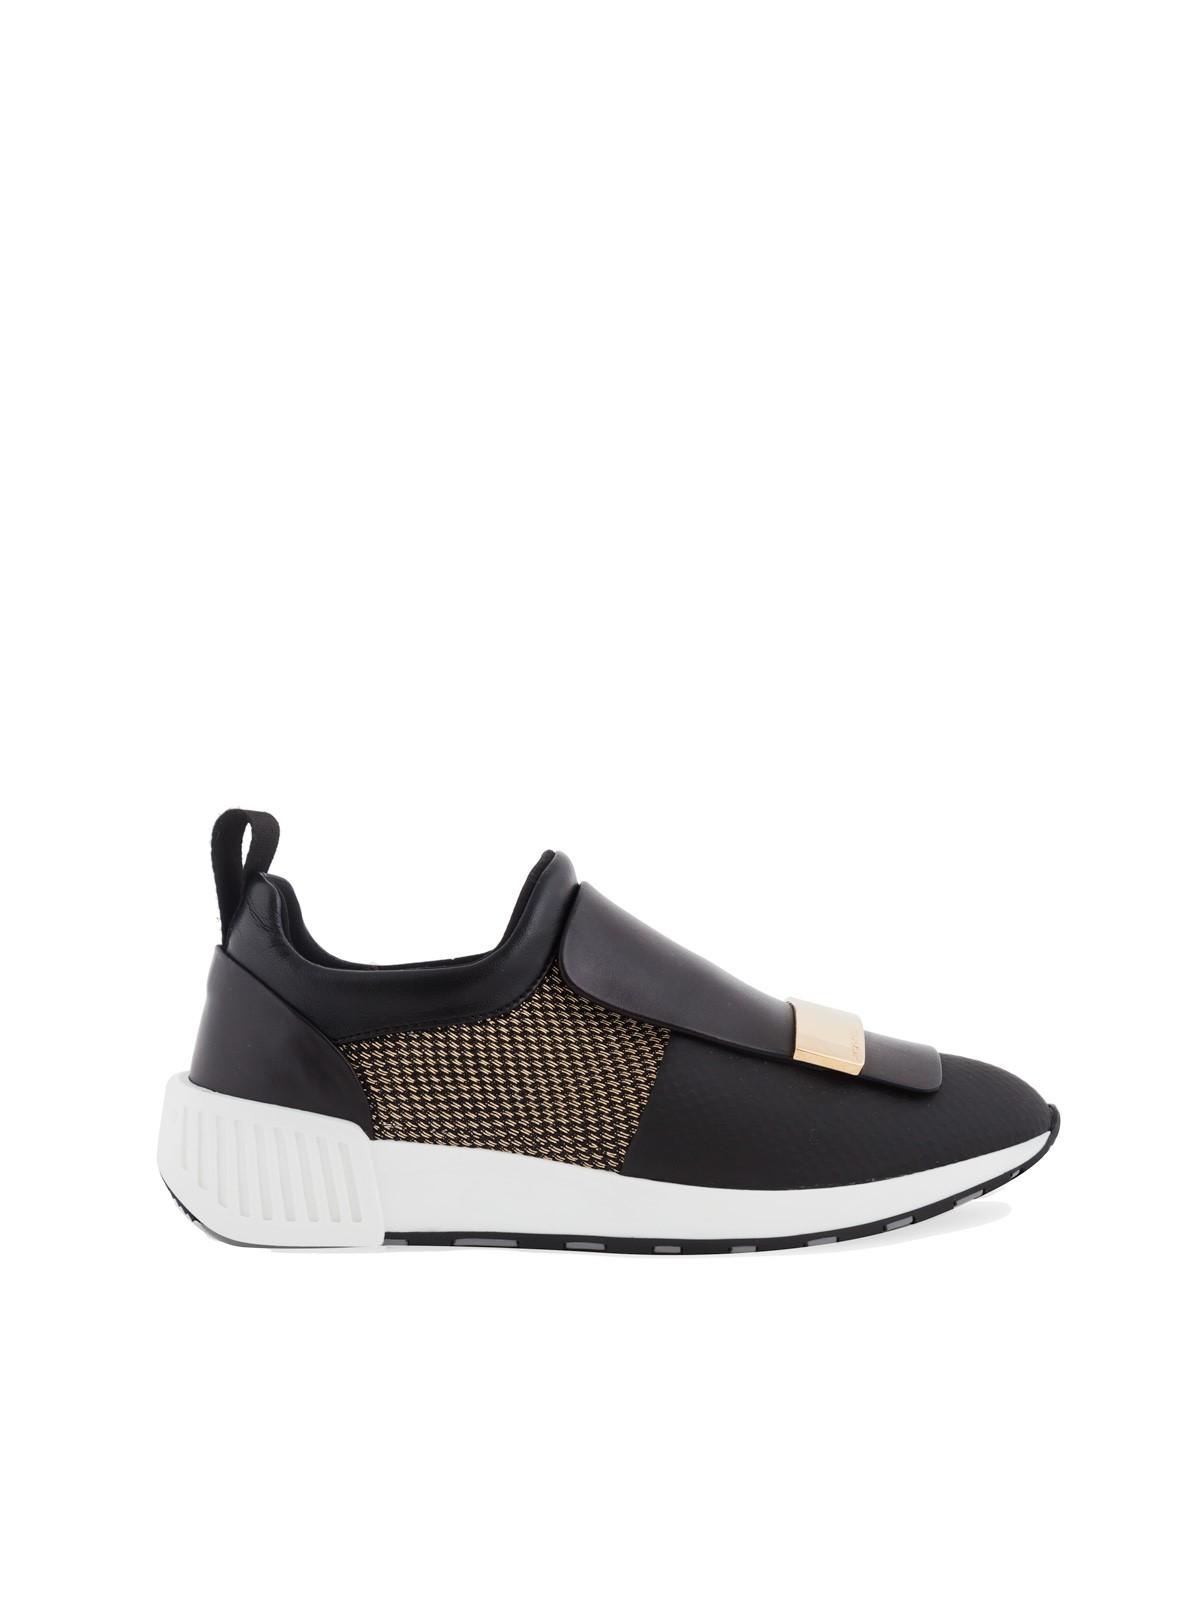 slip-on sneakers - Black Sergio Rossi RmGy7I